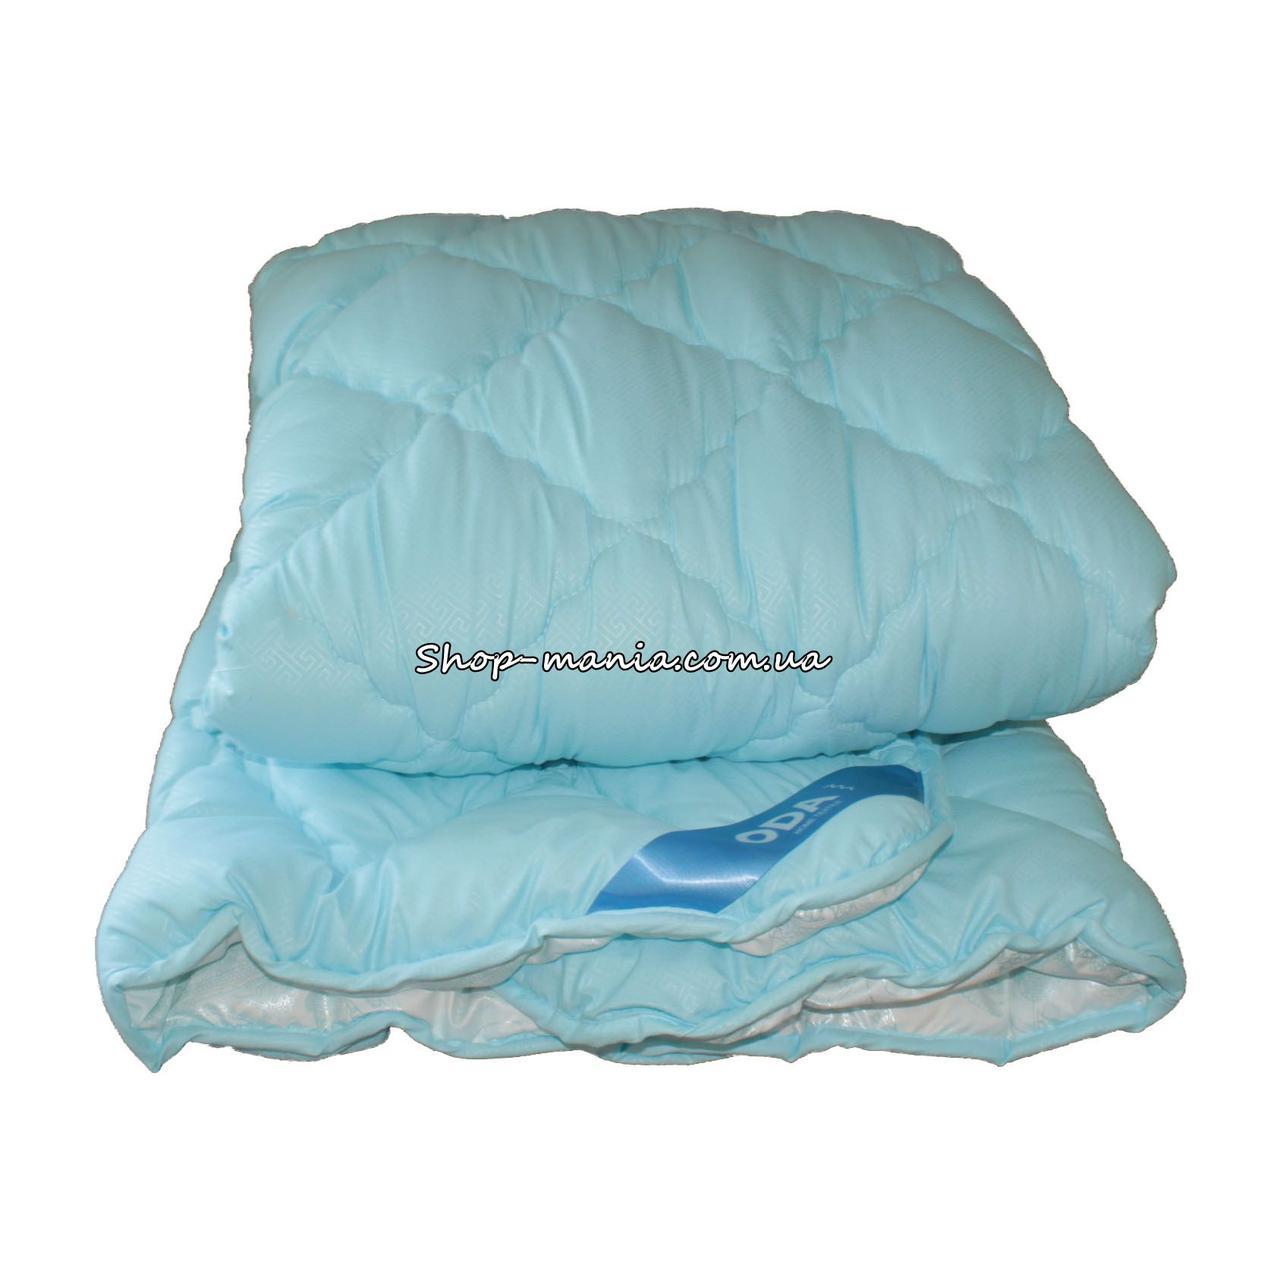 Одеяло зимнее теплое стеганное двуспальное 175х210 см холлофайбер ODA SM 8009-2 blue and white